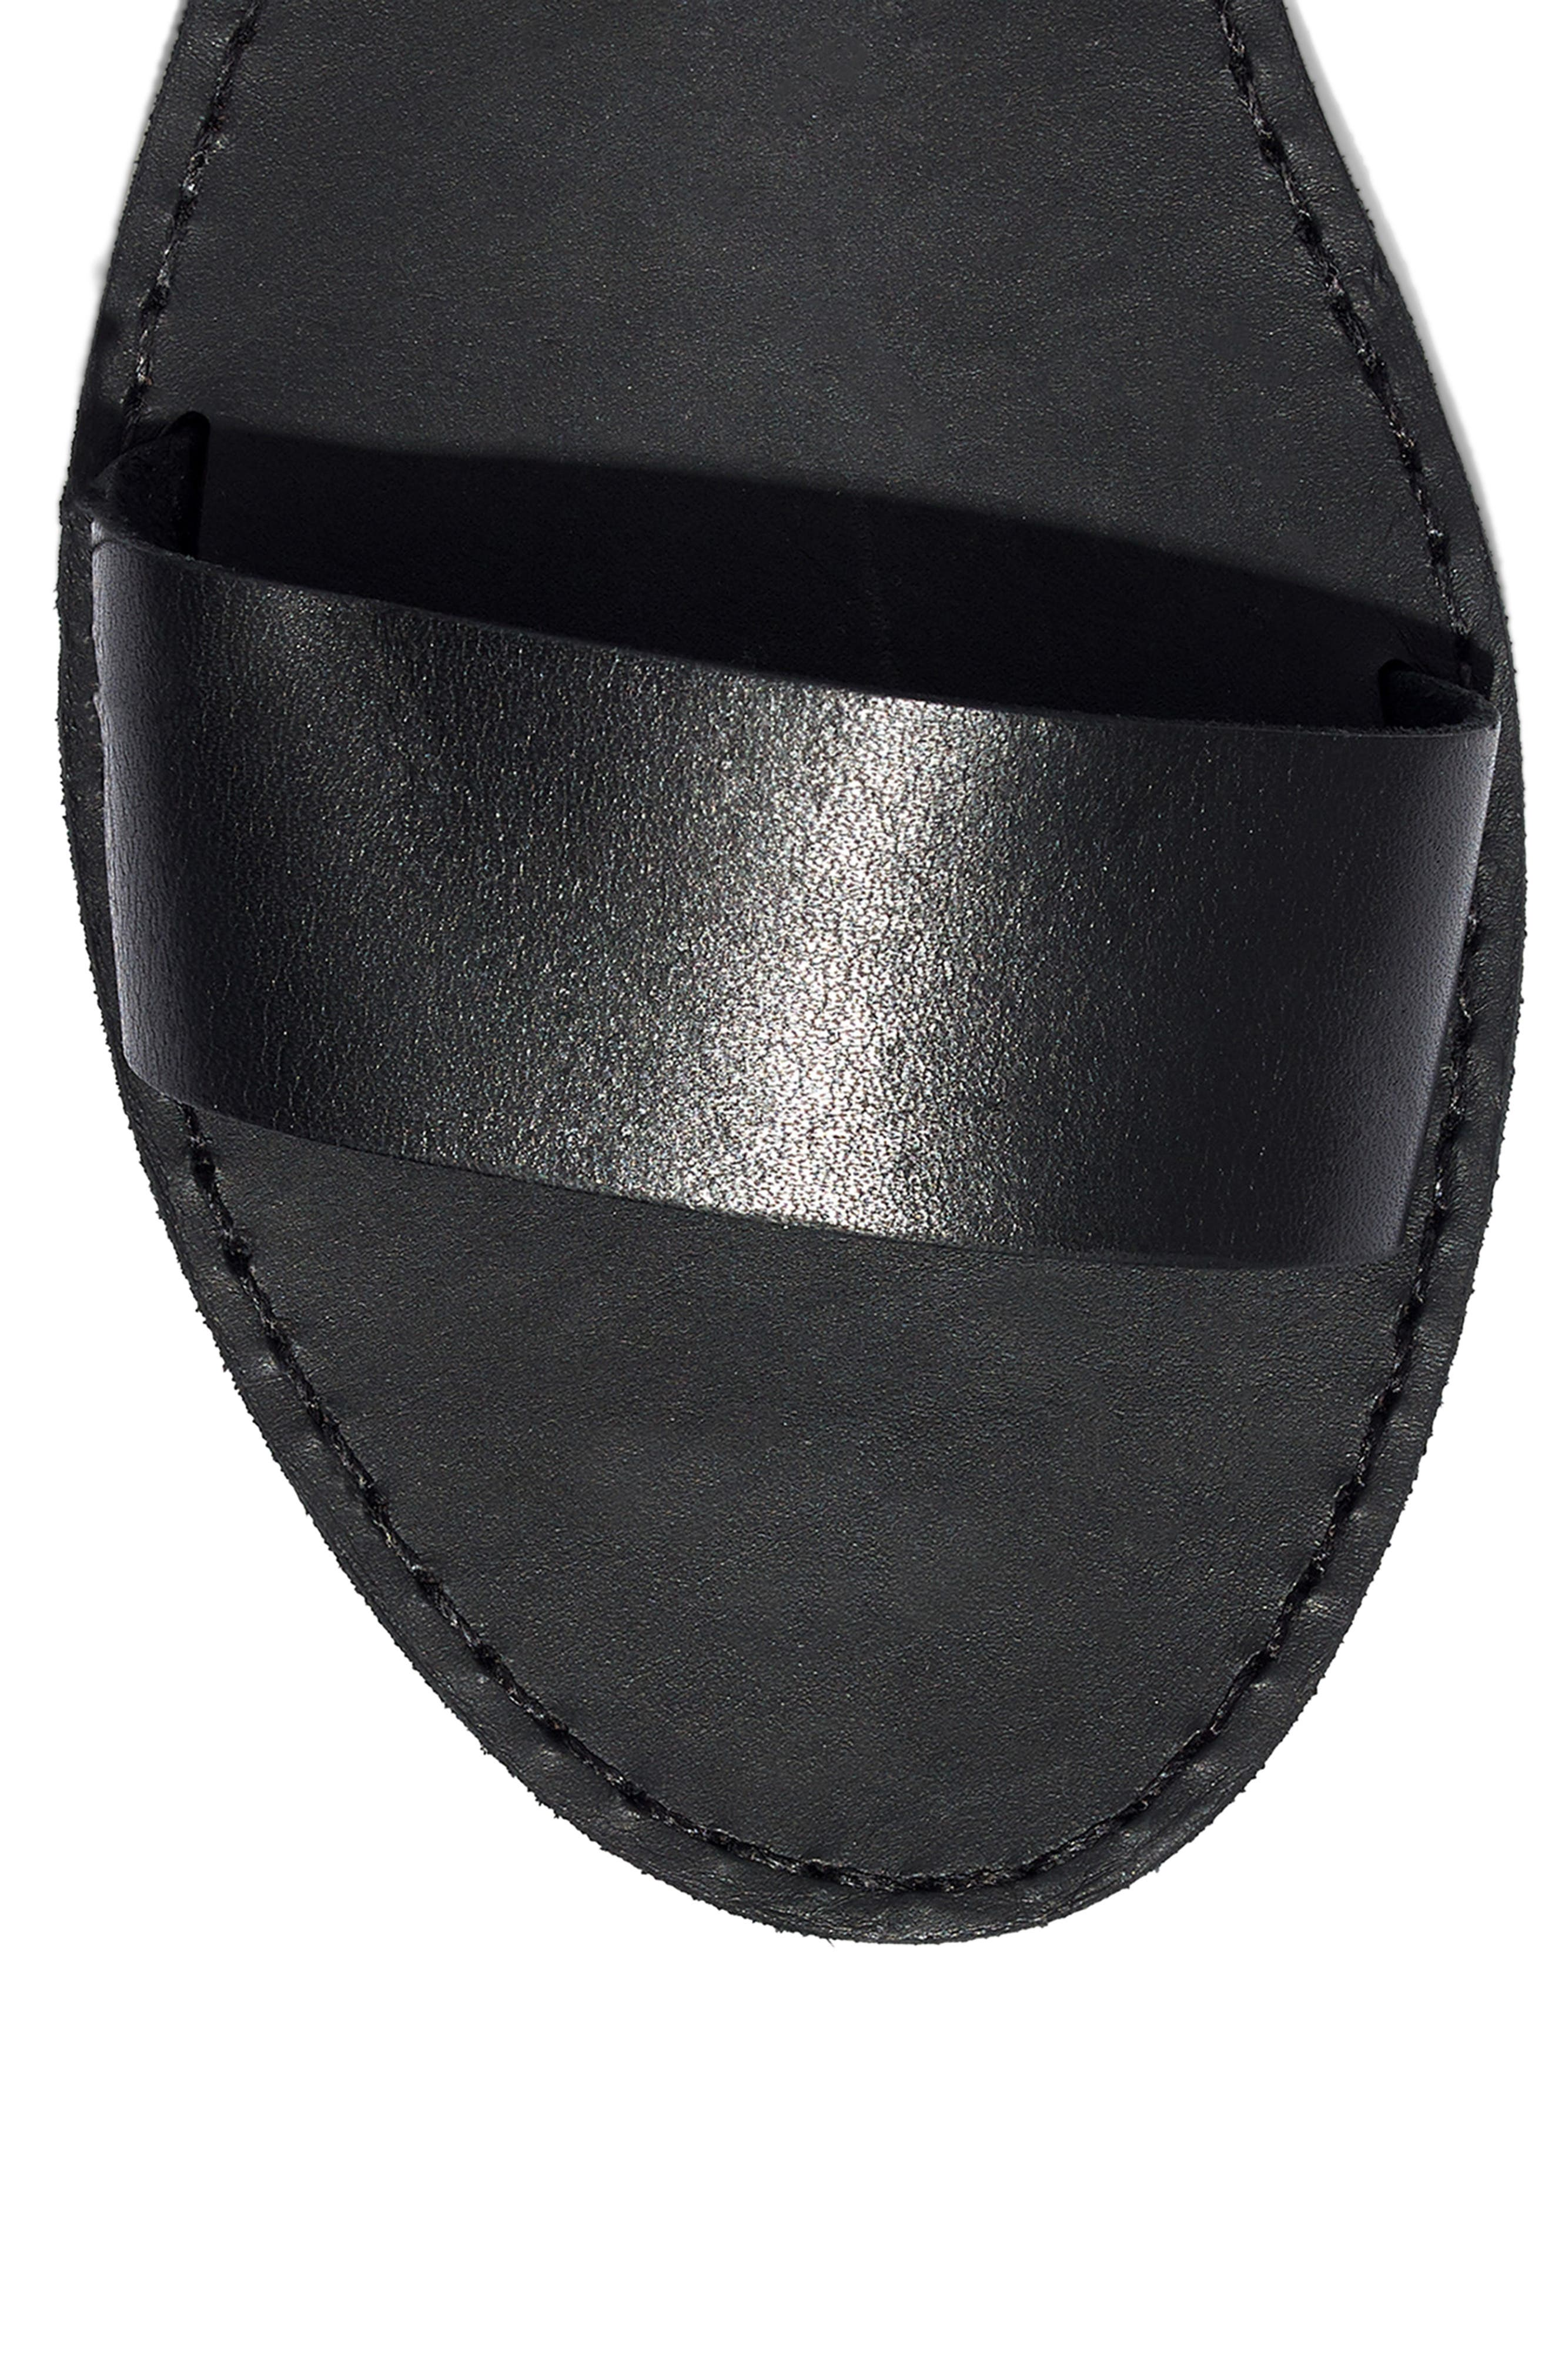 MADEWELL,                             The Boardwalk Ankle Strap Sandal,                             Alternate thumbnail 7, color,                             TRUE BLACK LEATHER